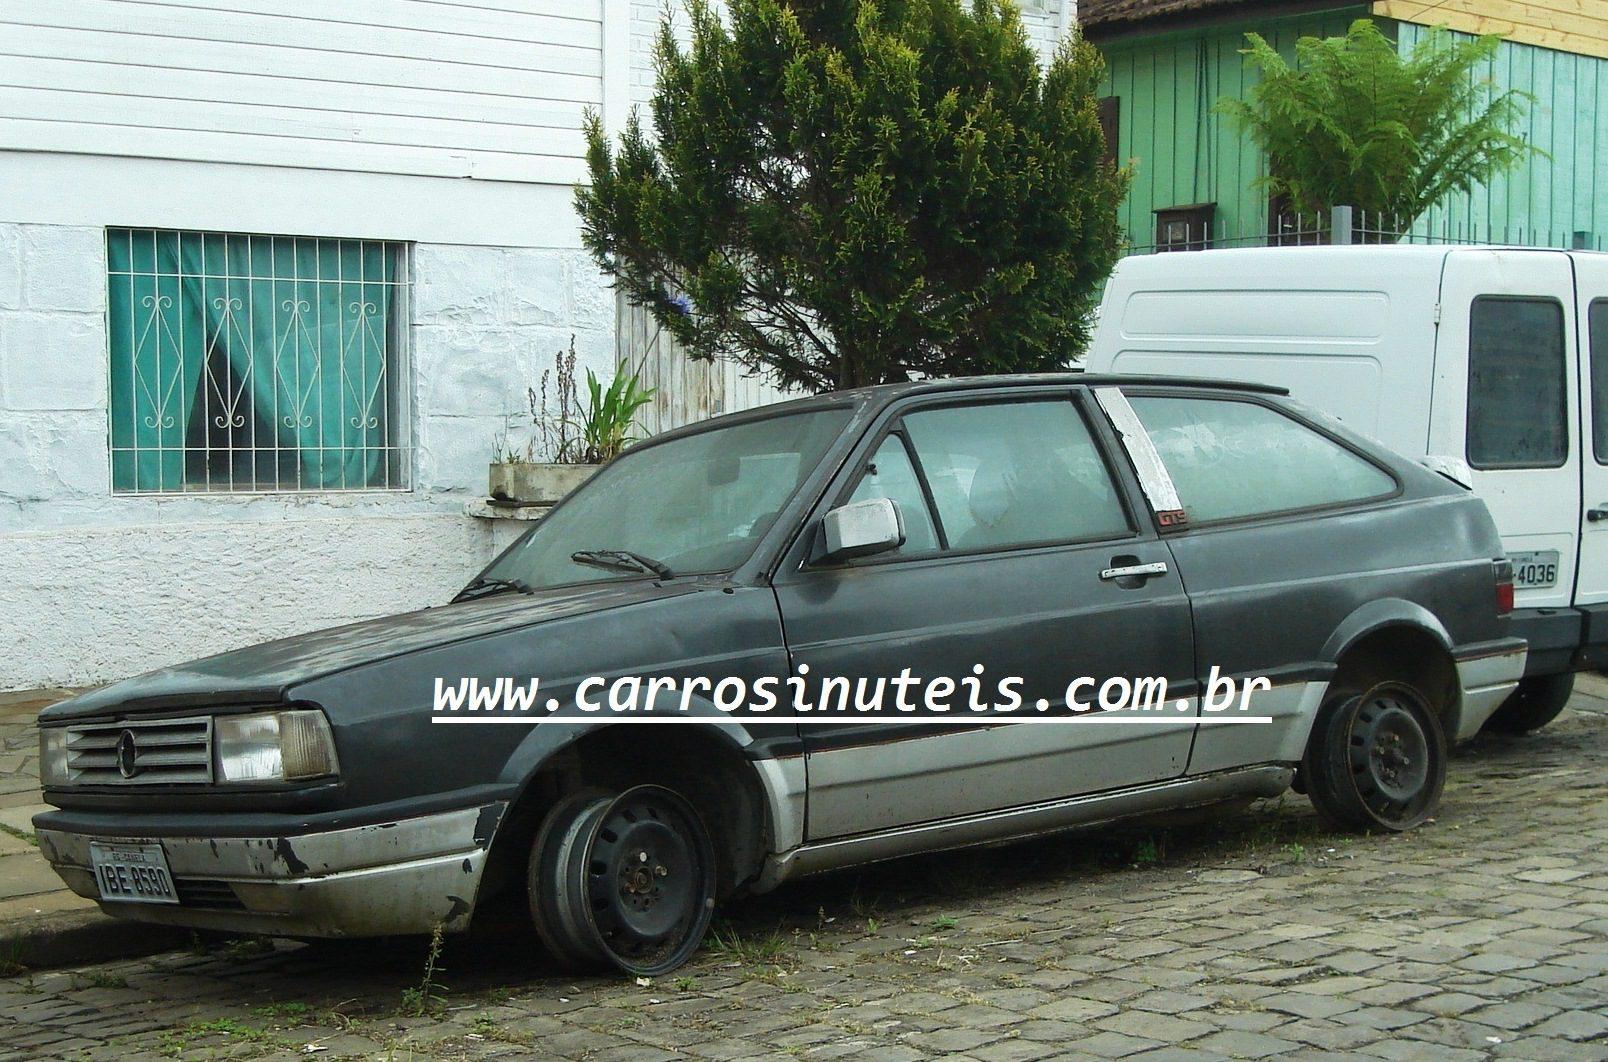 GenaroGol_gts_canela-21 VW Gol